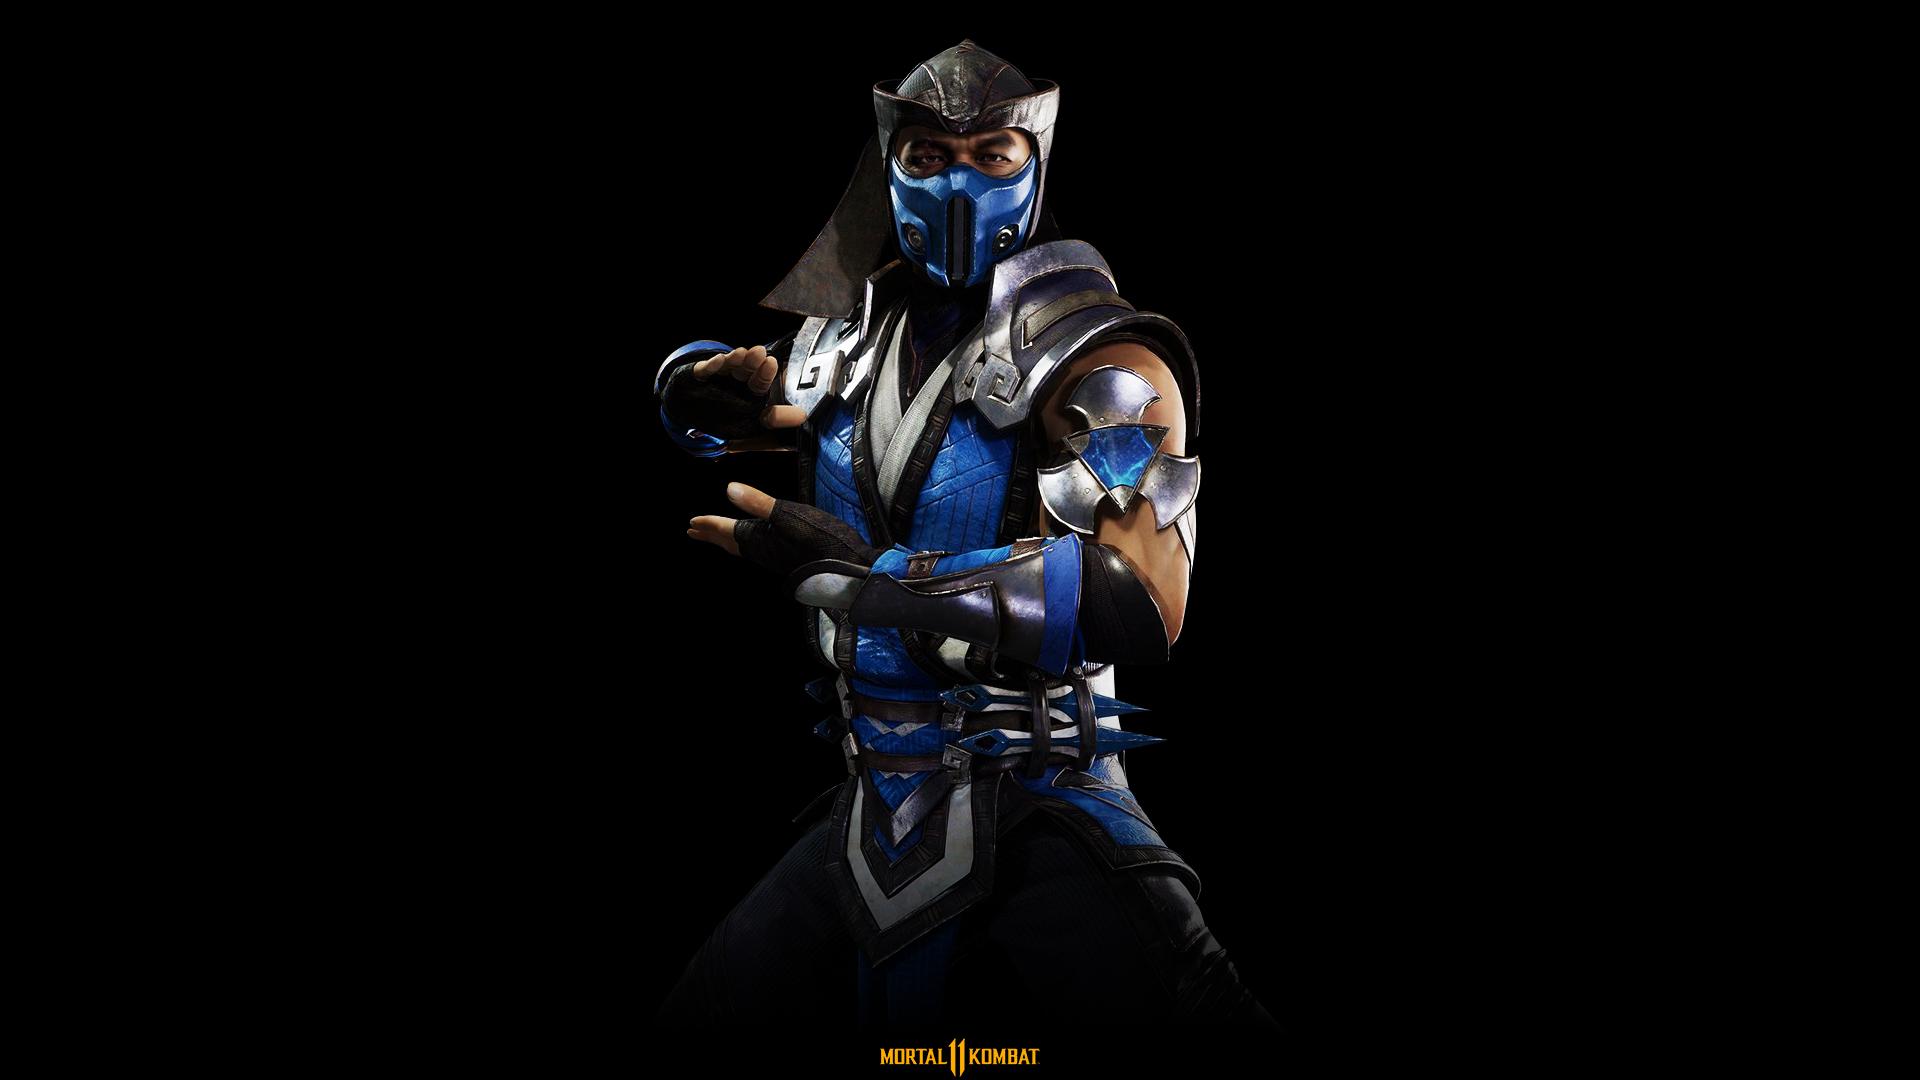 General 1920x1080 Mortal Kombat Mortal Kombat 11 Sub Zero Mortal Kombat X comic art comic books Injustice 2 Video Game Warriors video games